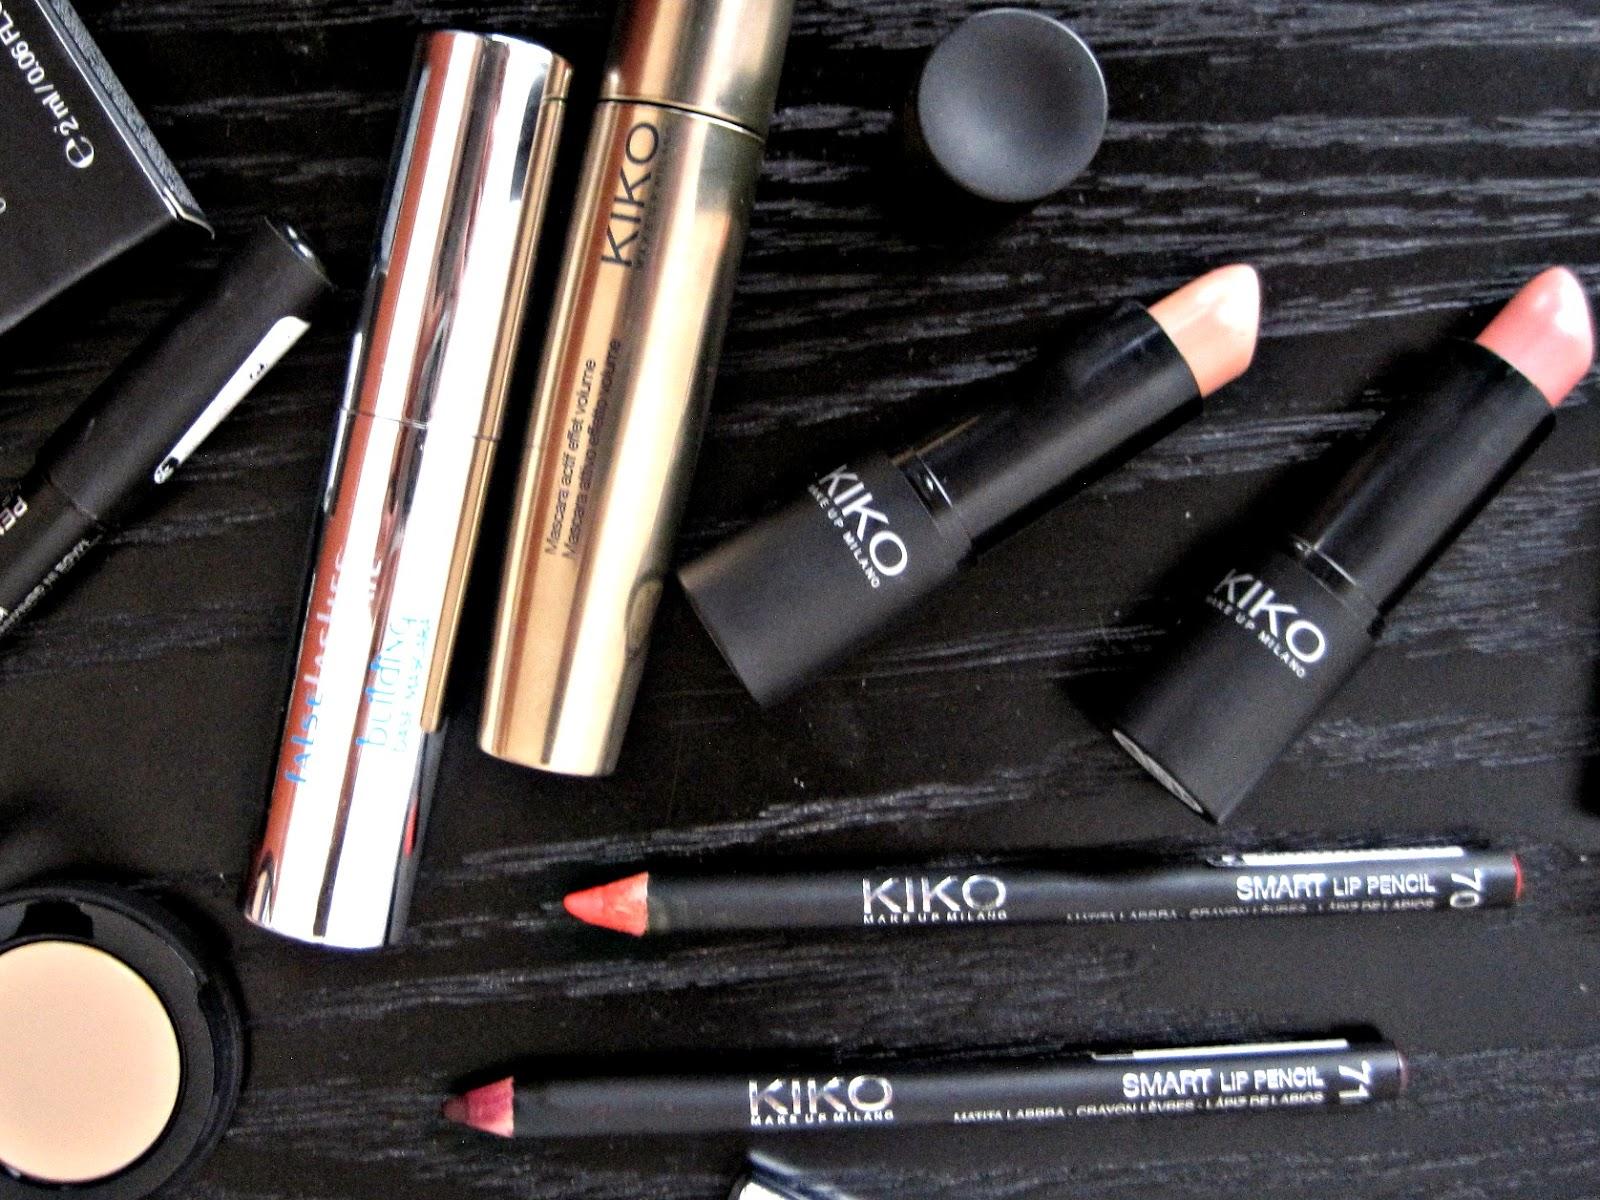 kiko smart lip pencil swatch lipstick 900 902 swatch mascara volumeyes full coverage concealer kiko